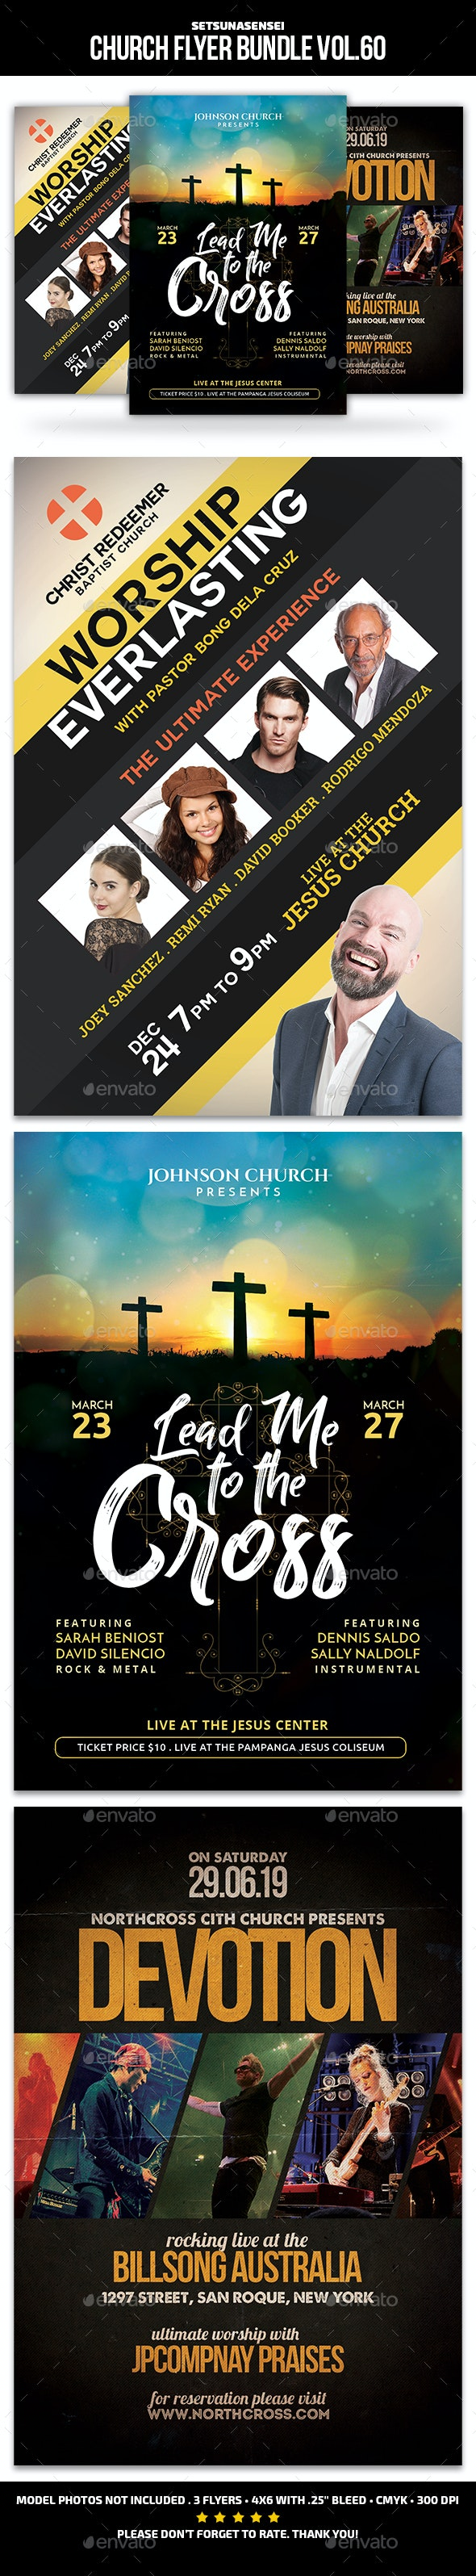 Church Flyer Bundle Vol. 60 - Church Flyers